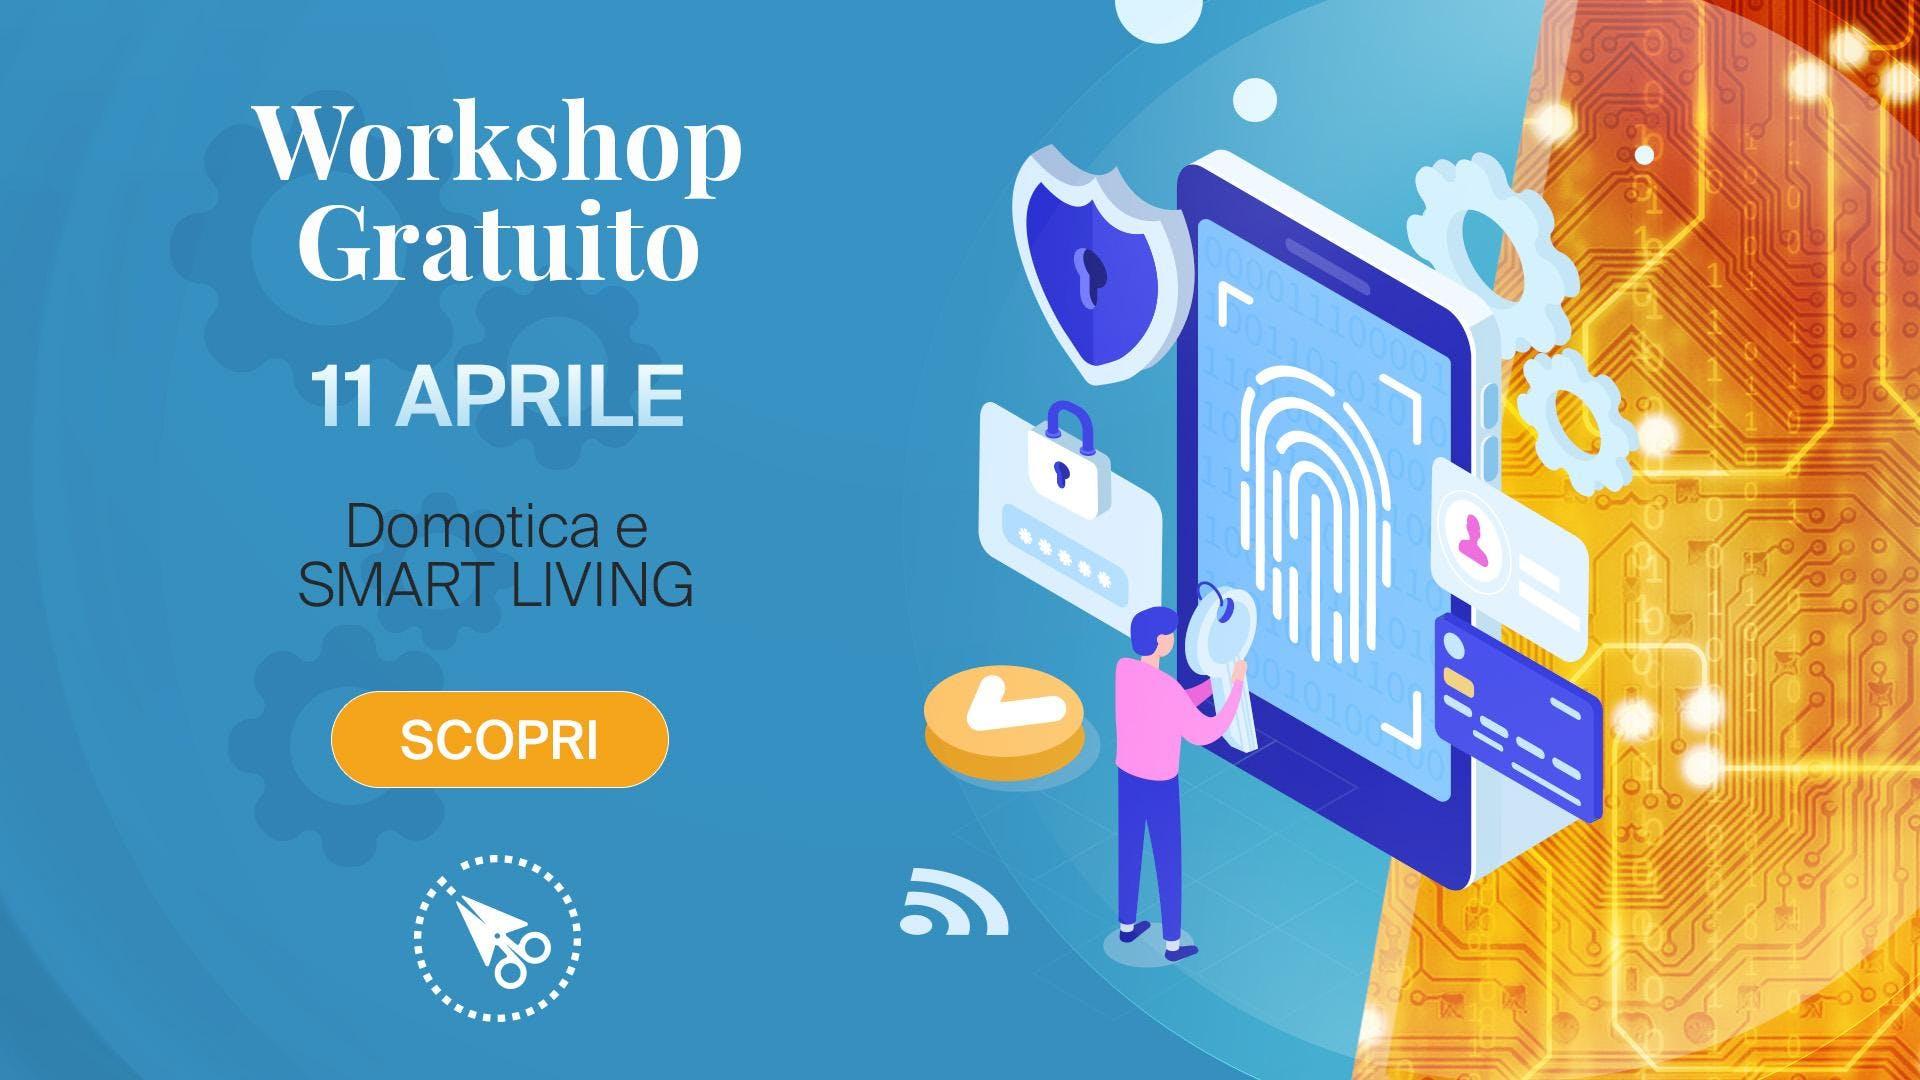 Workshop GRATUITO -> Domotica e SmartLiving: